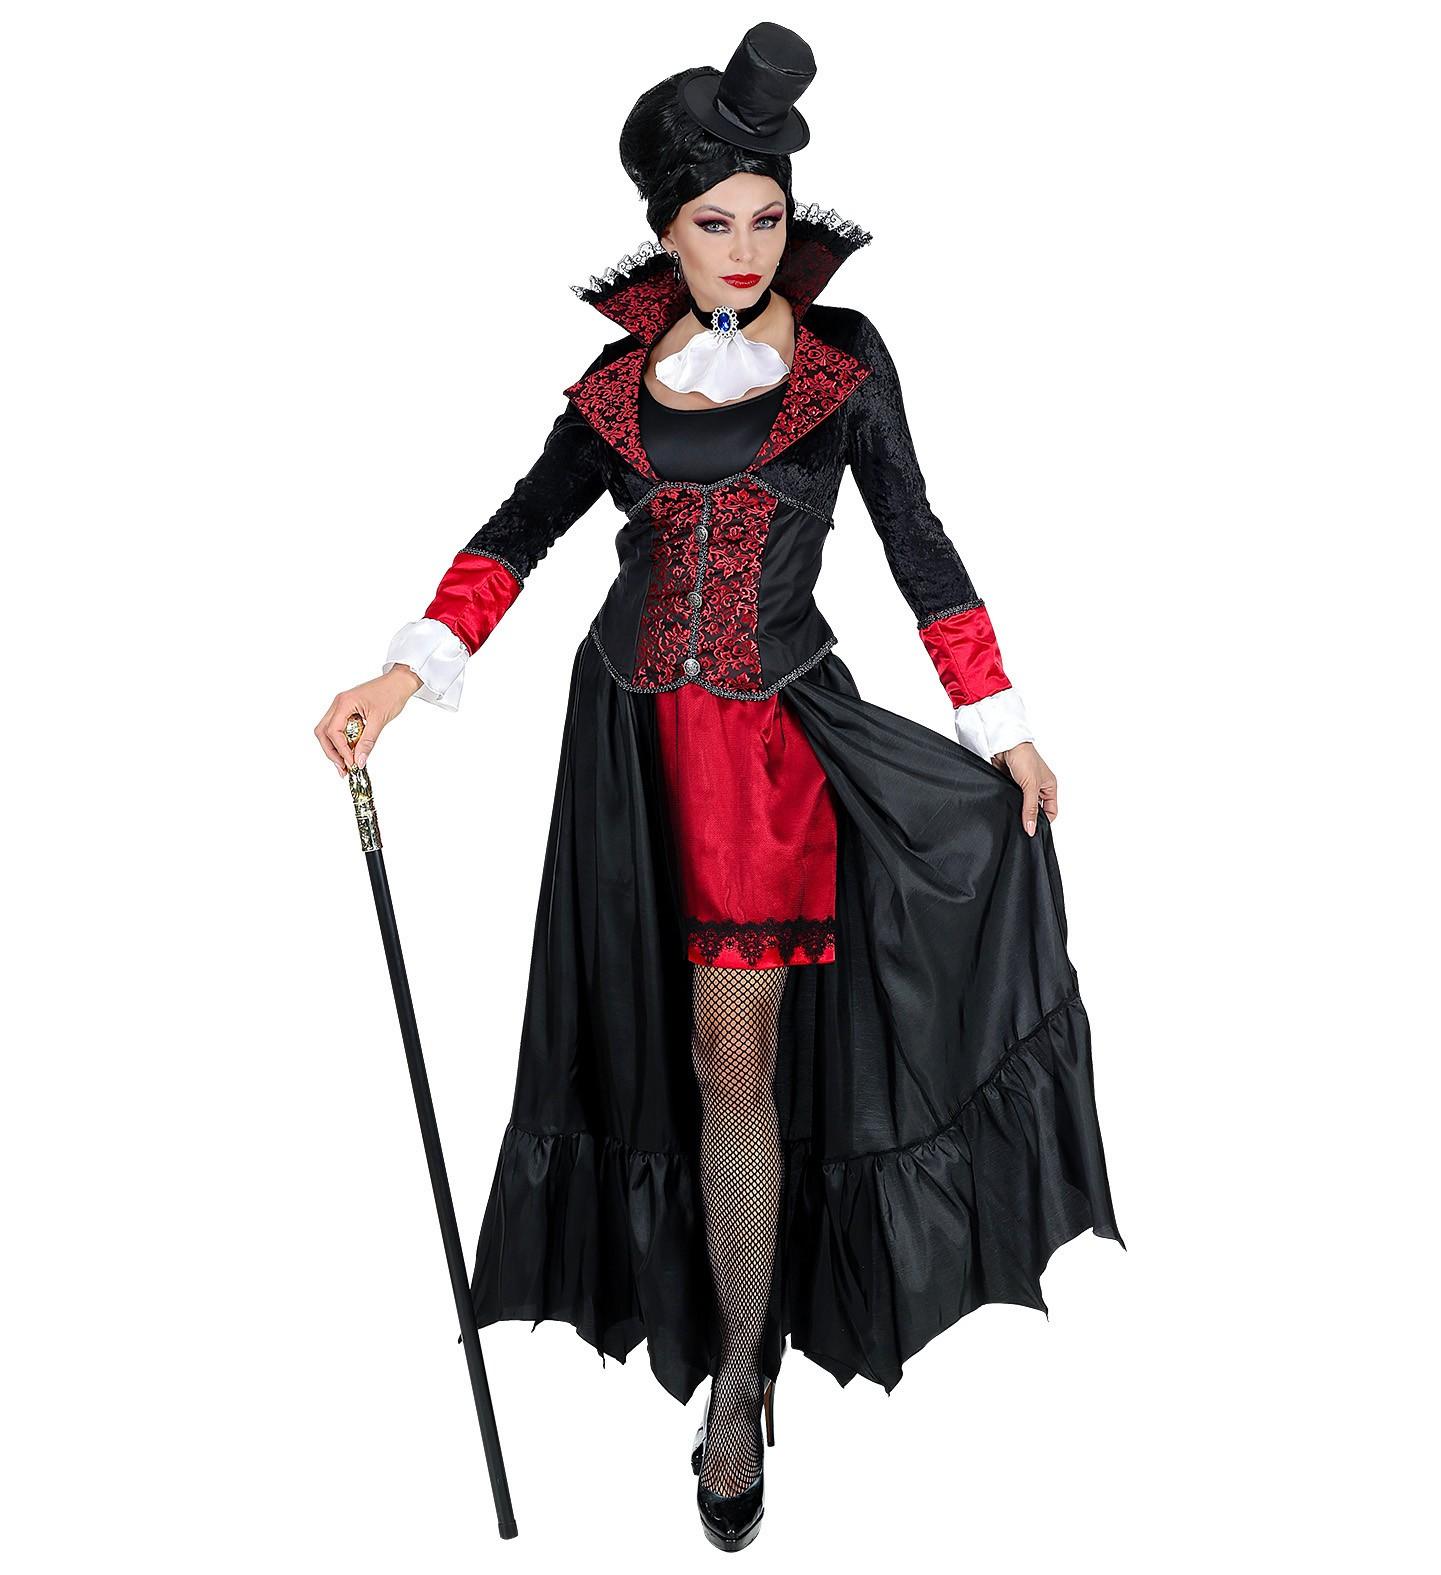 Professionele Halloween Kostuums.Vampier Jurk Dames Jokershop Be Halloween Kleding